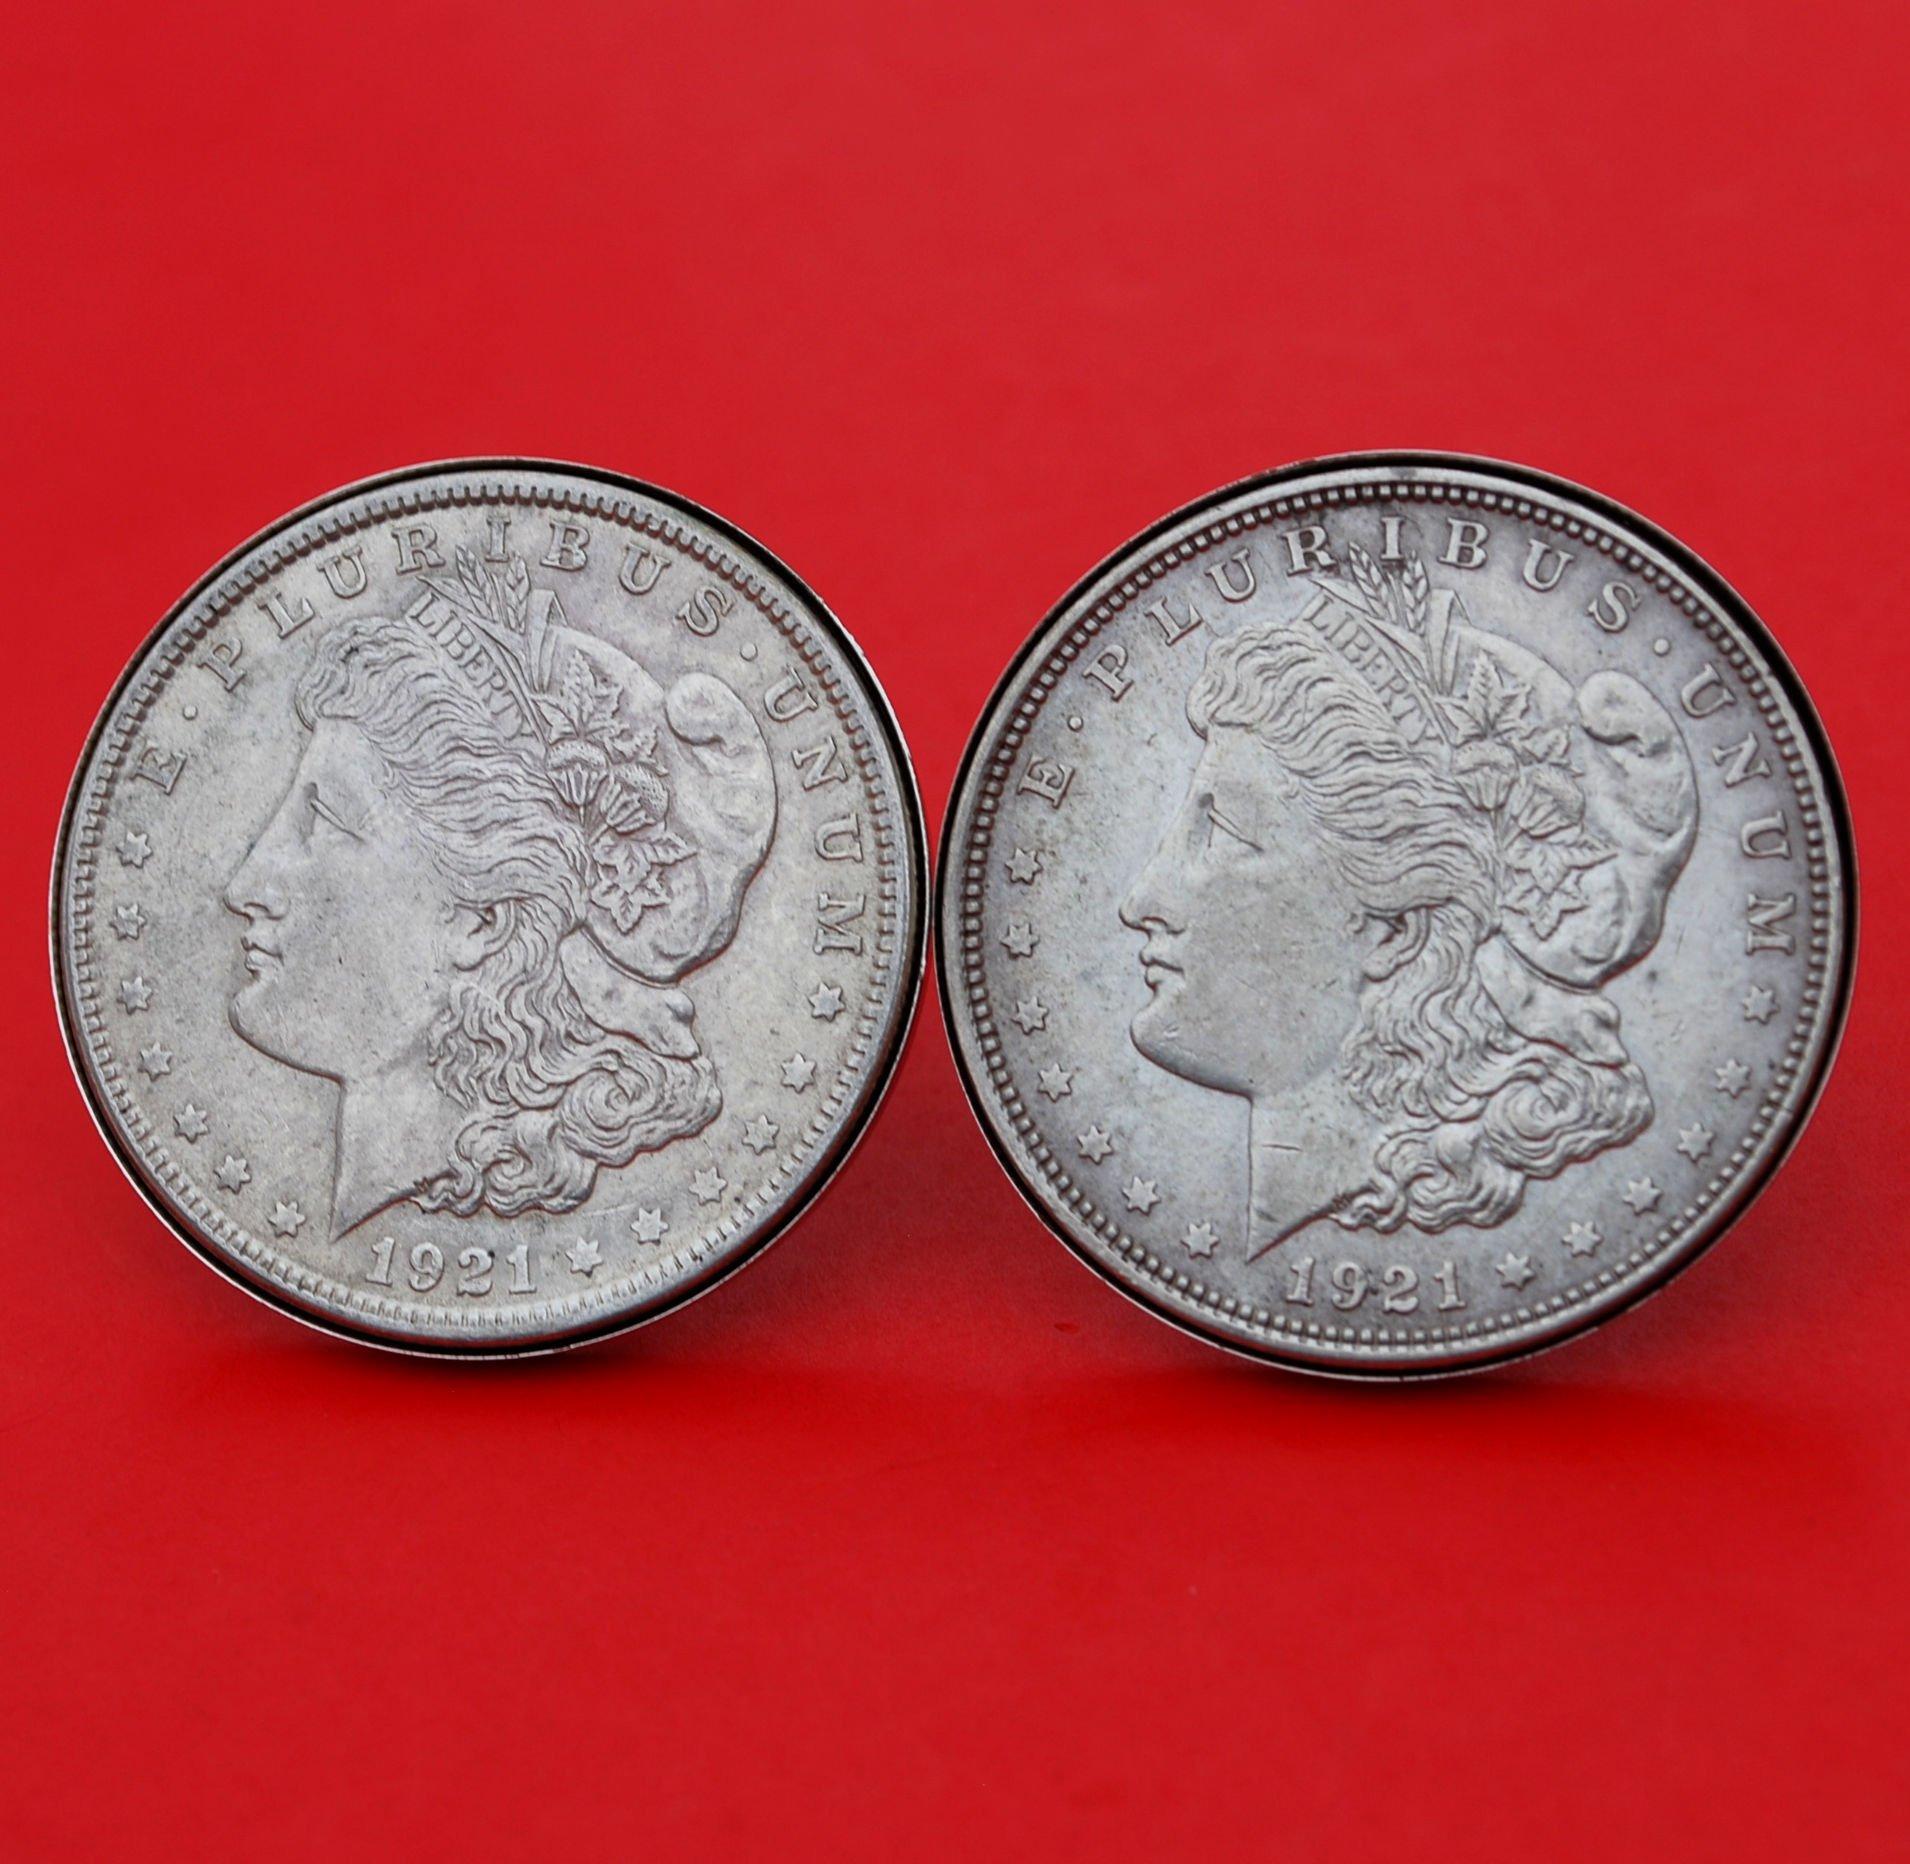 US 1921 Morgan Silver Dollar Silver Cufflinks NEW